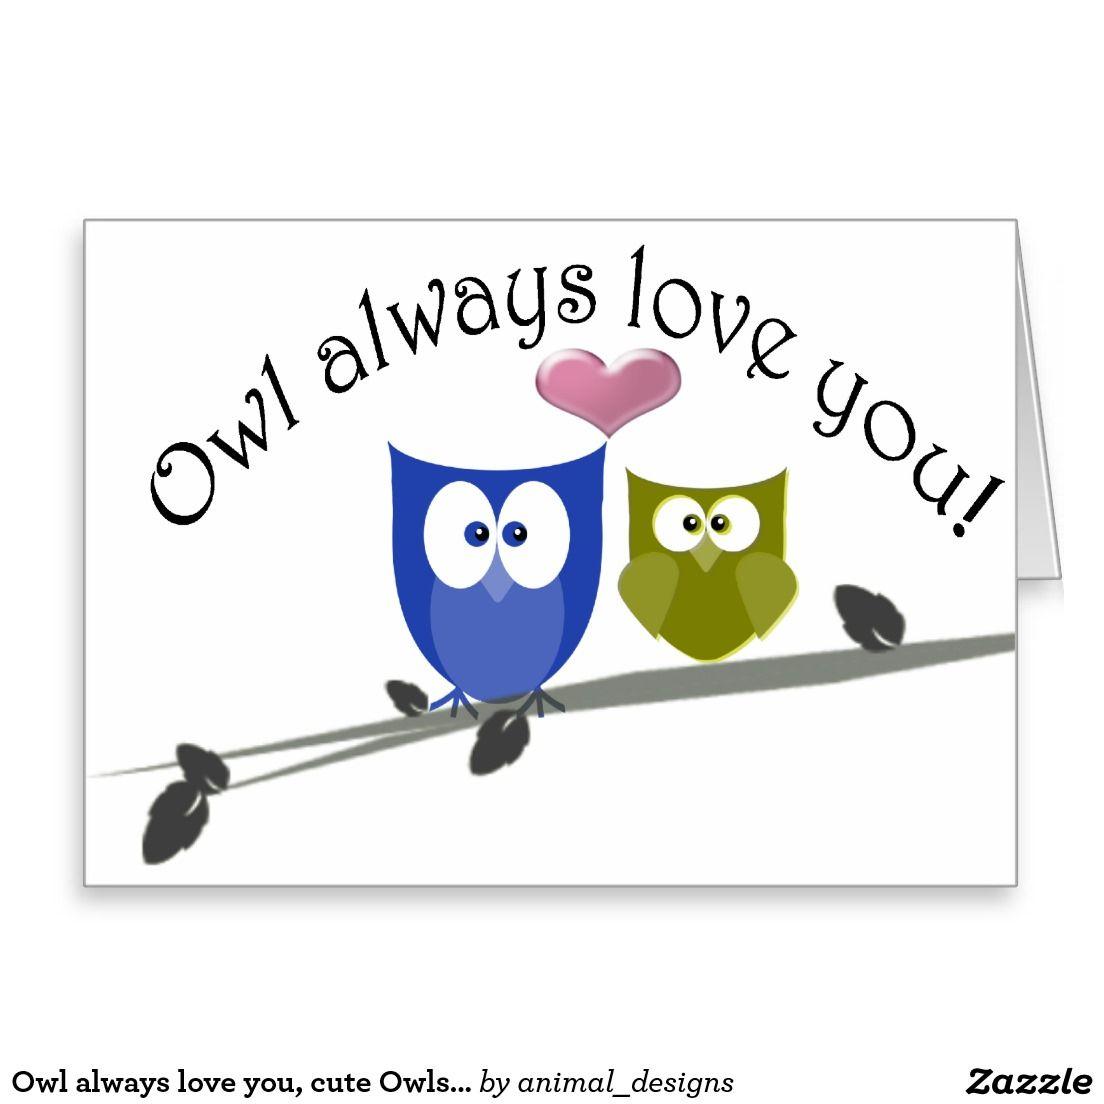 Owl always love you, cute Owls Art Greeting Card